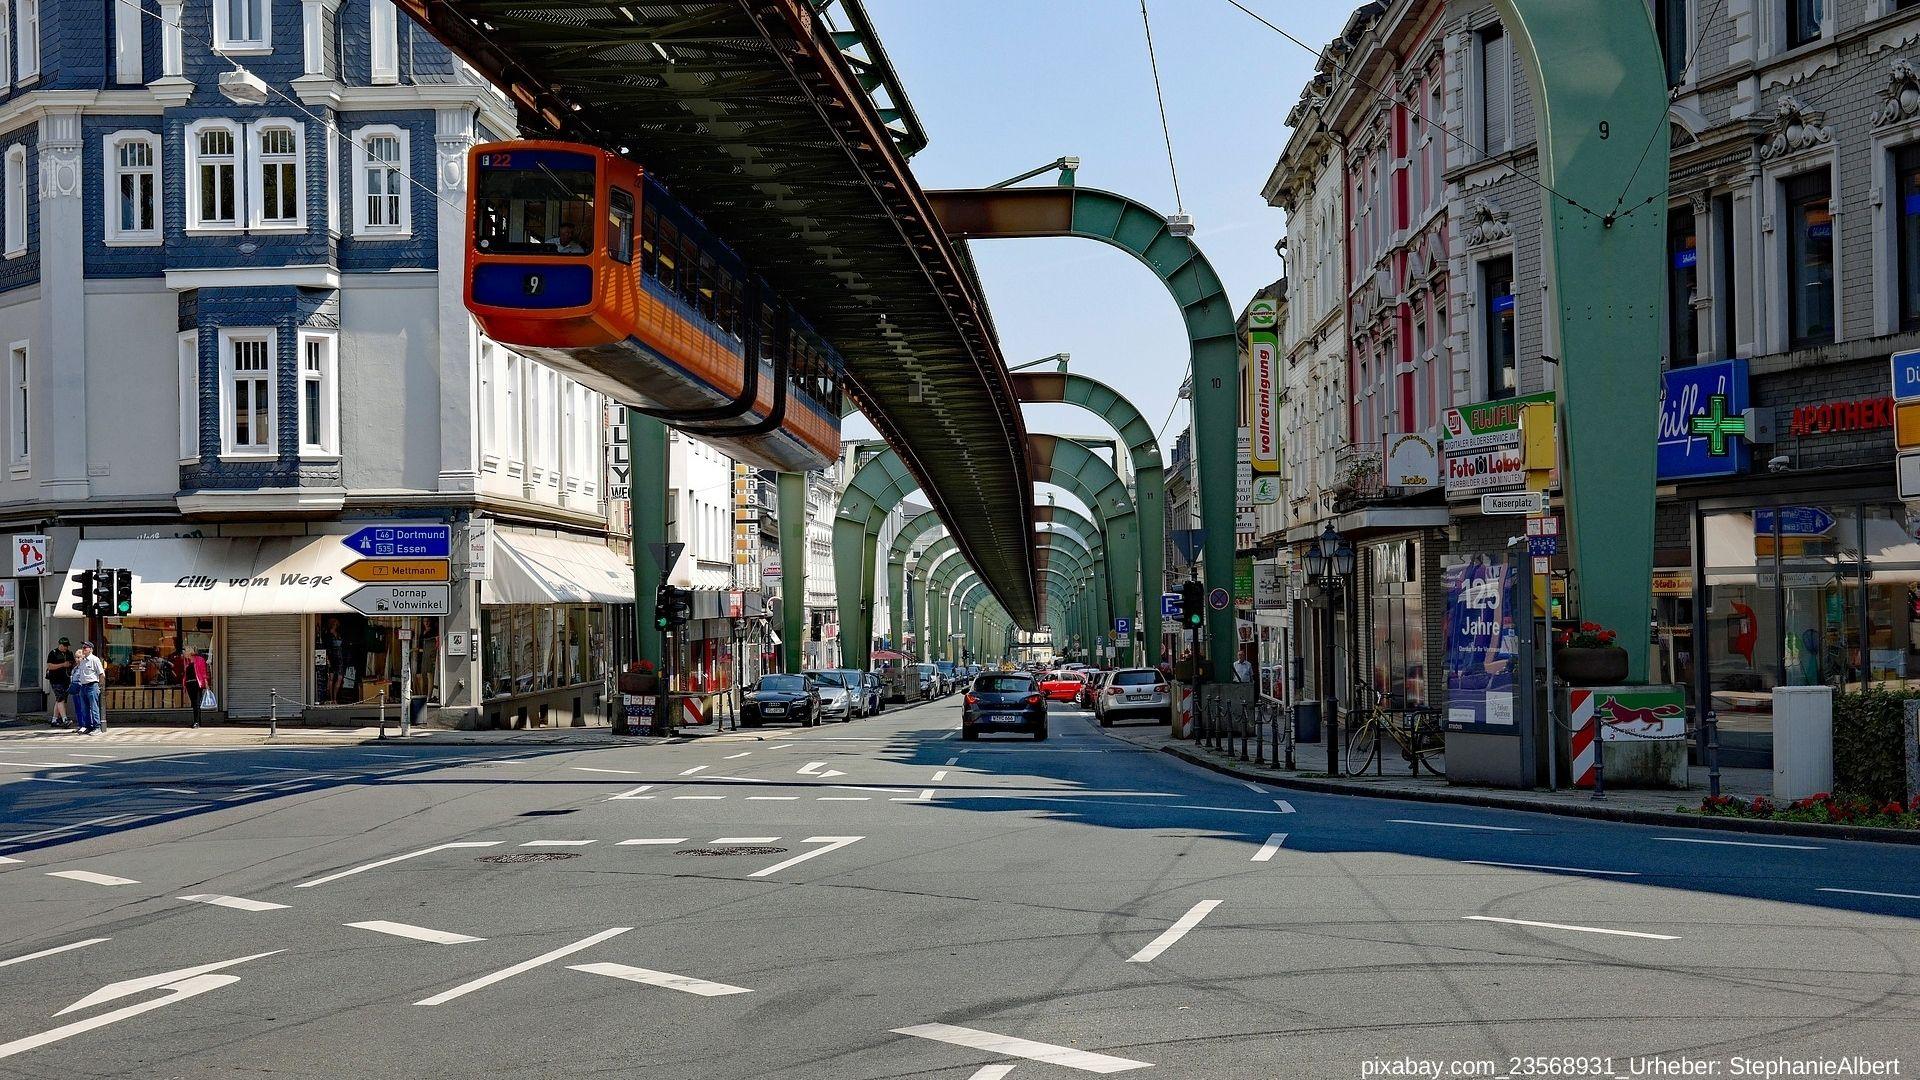 Zeltverleih Wuppertal - Meventa als kompetenter Ansprechpartner für den Zeltverleih